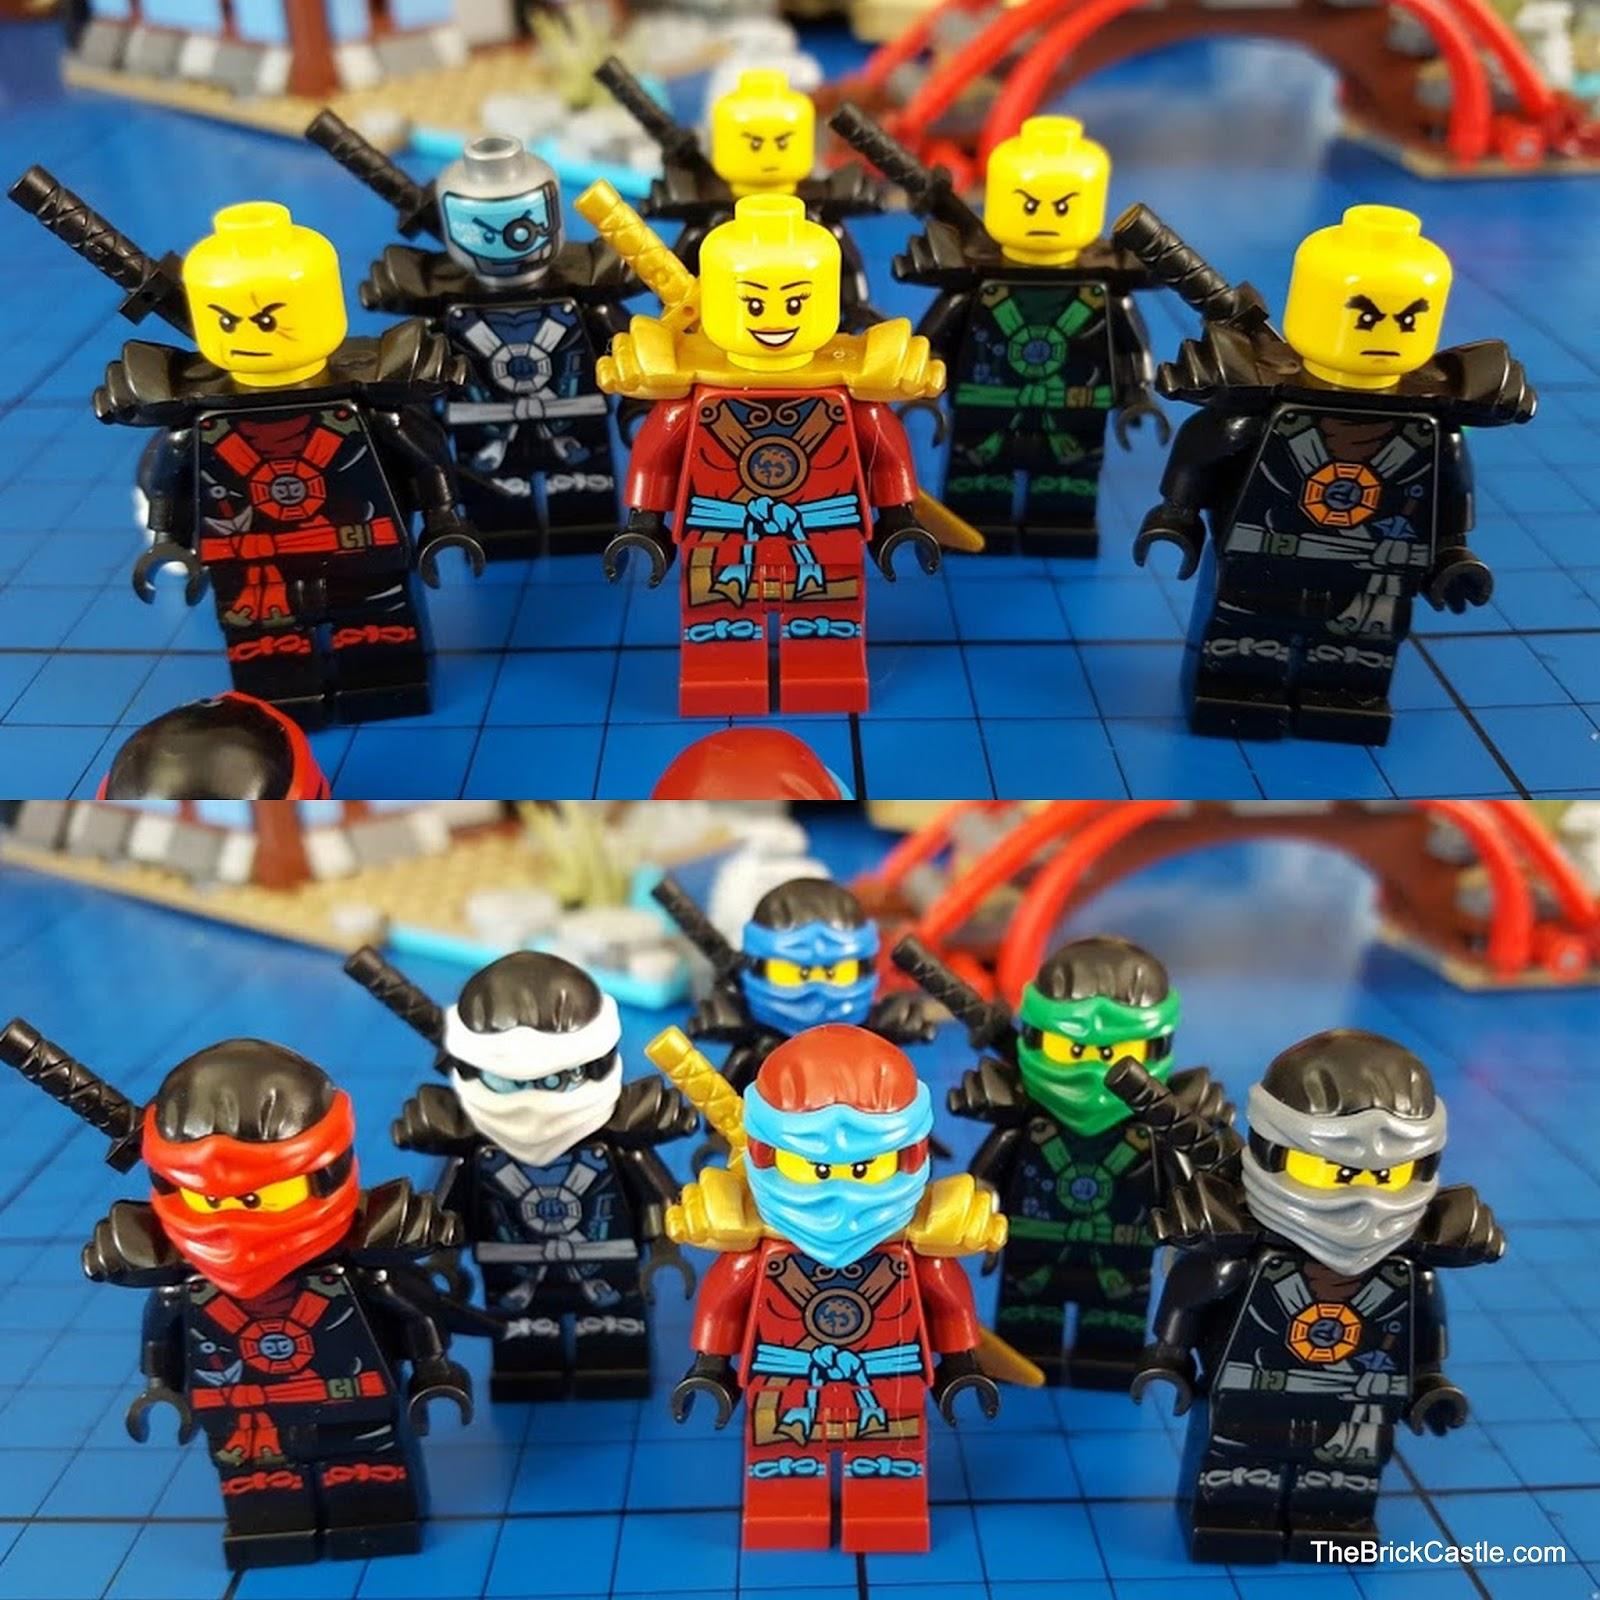 The brick castle lego ninjago temple of airjitzu set - Lego ninjago 4 ...